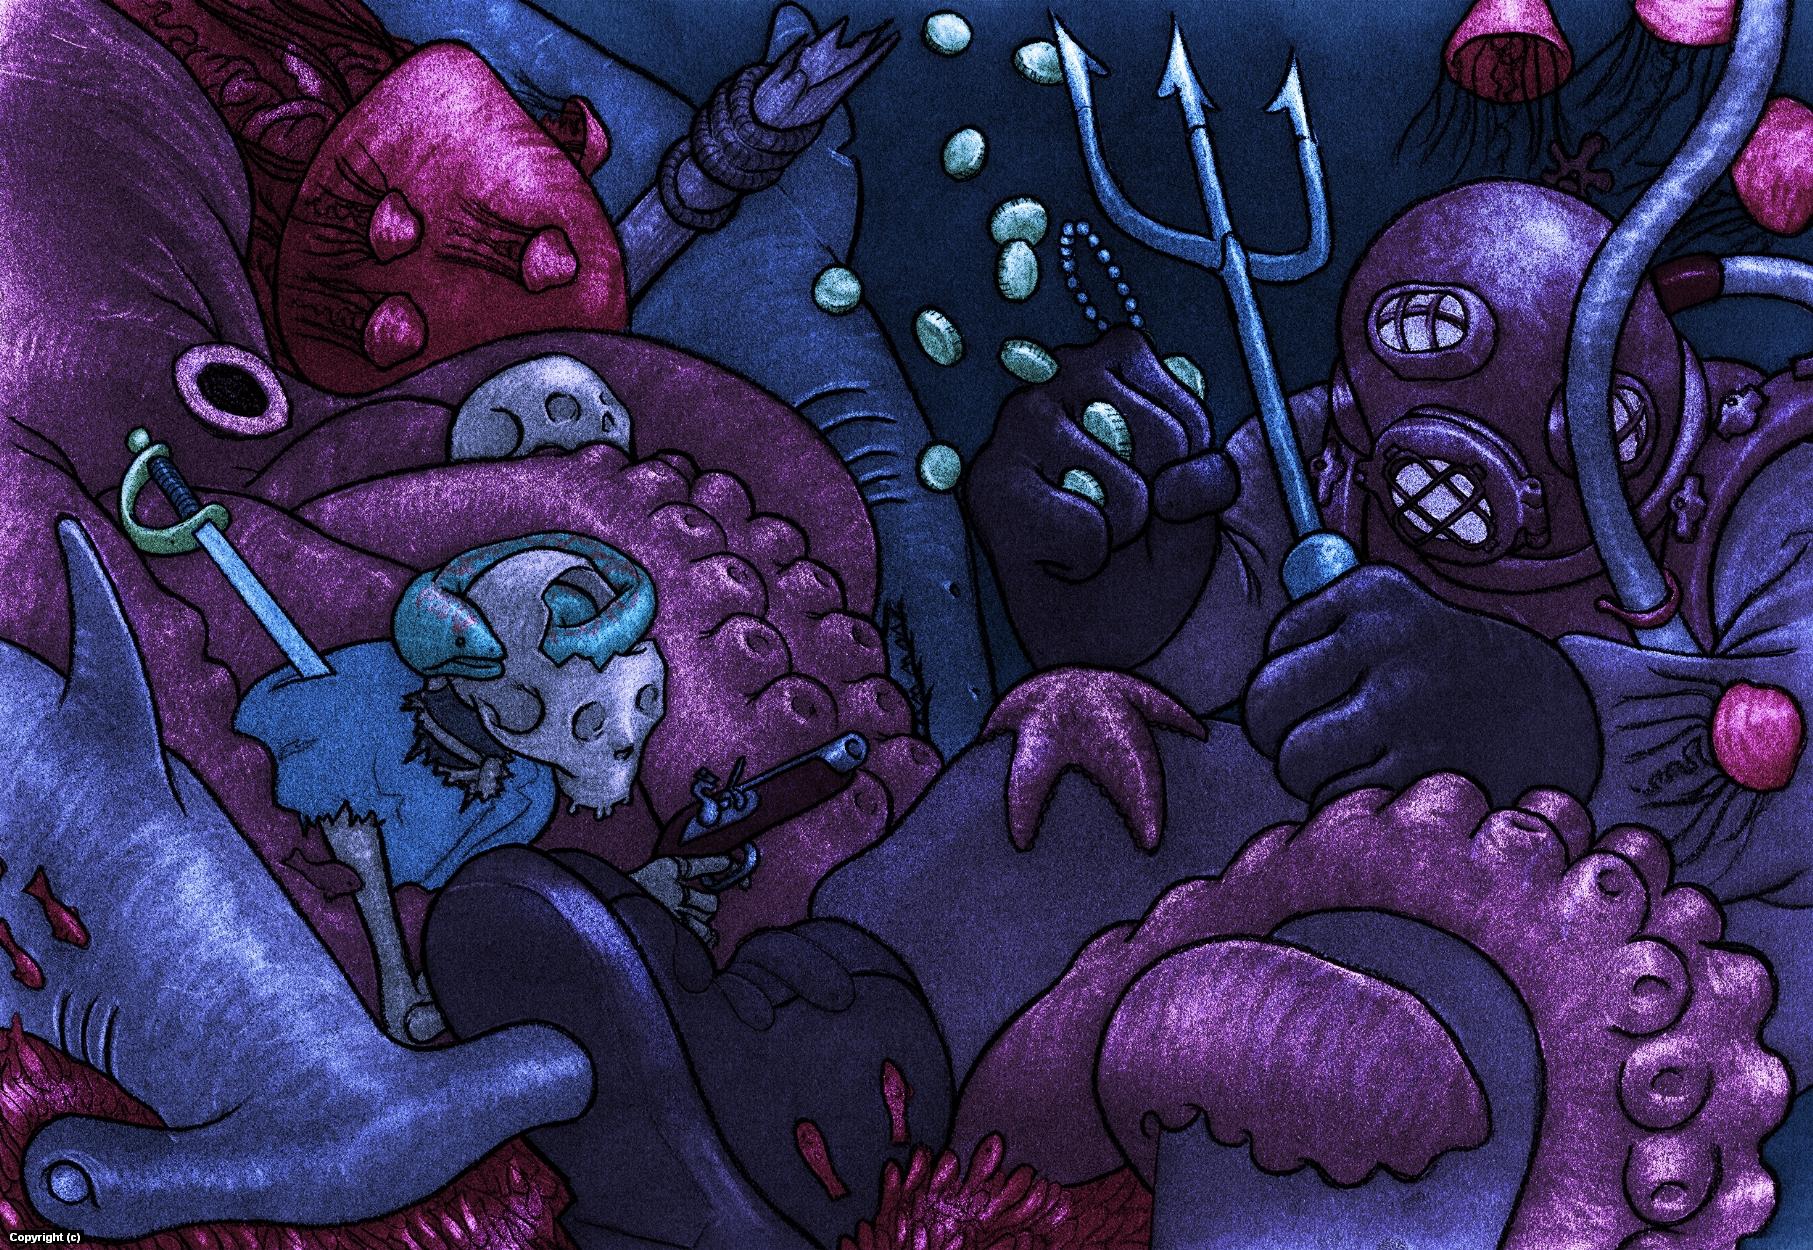 The Depths Artwork by Matthew Filipkowski